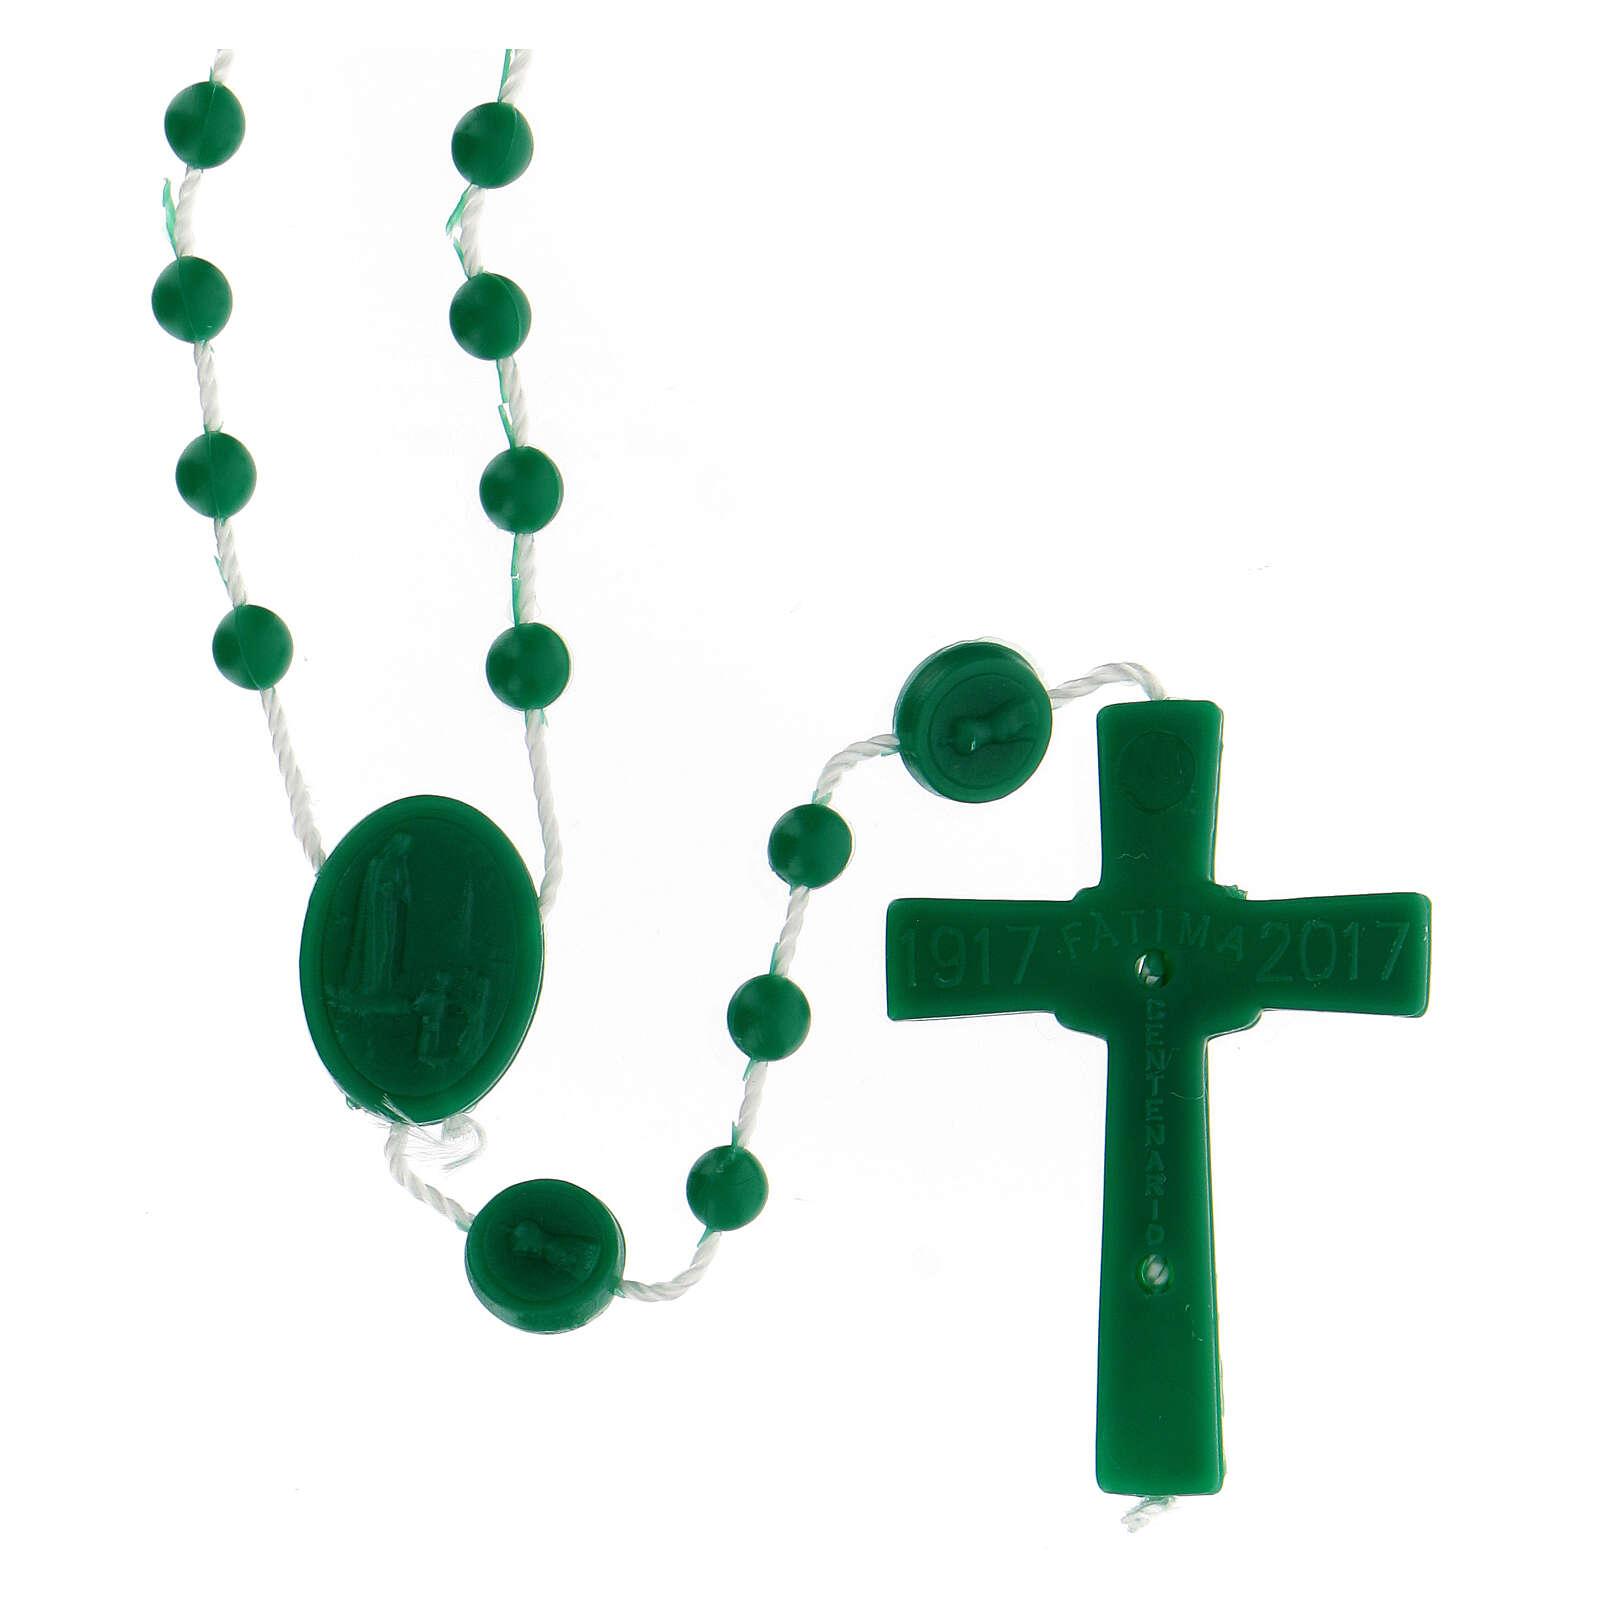 STOCK Chapelet Fatima grains verts nylon 4 mm 4